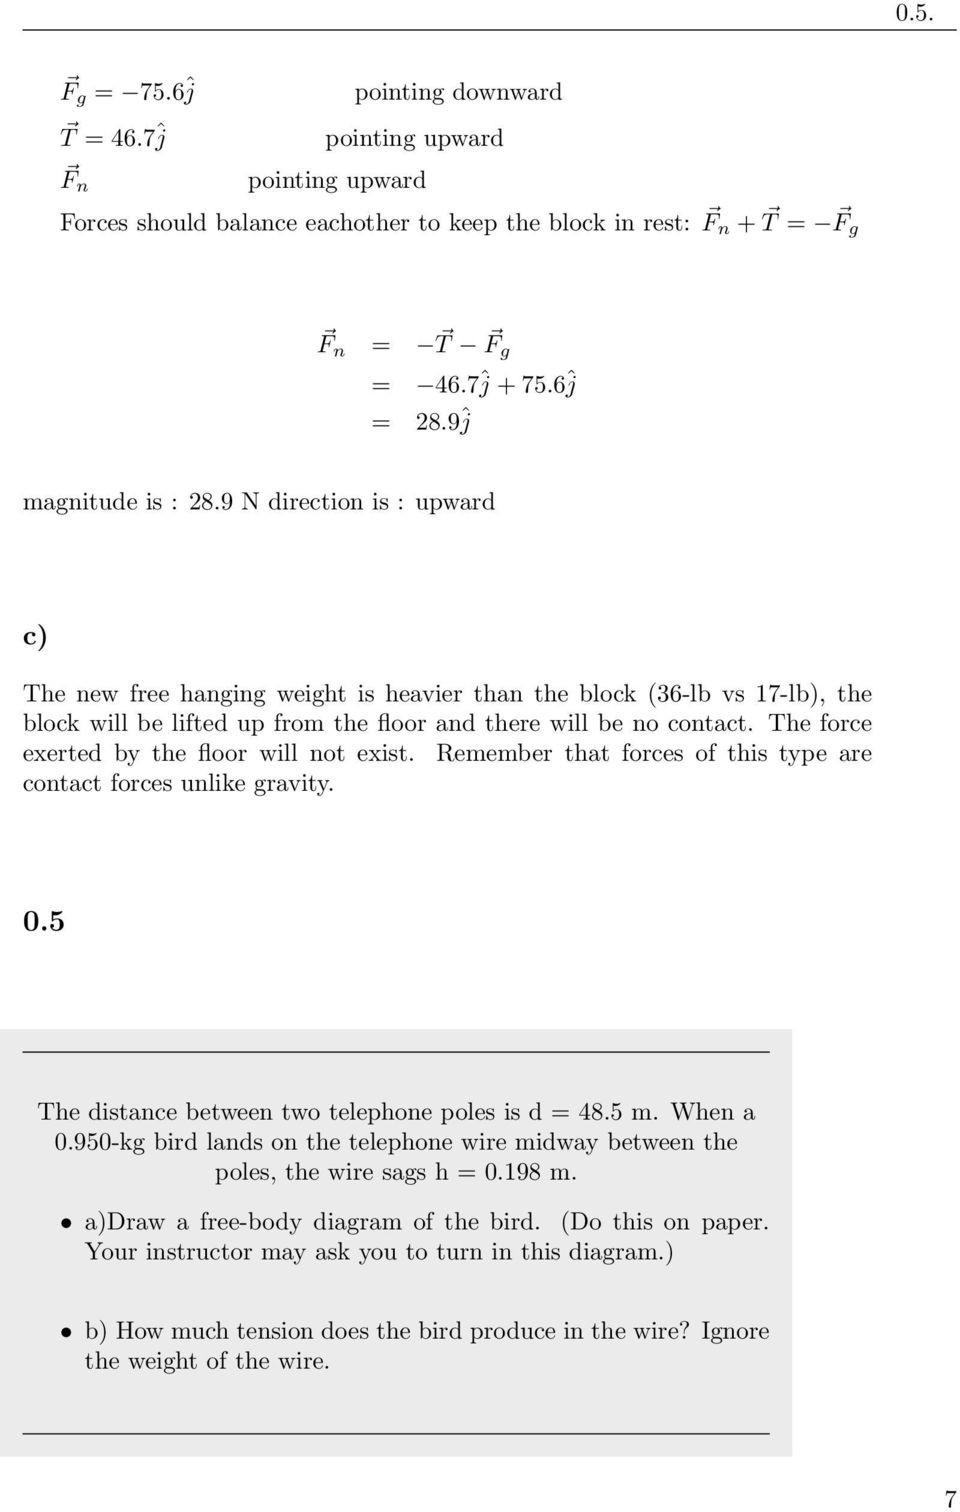 Free Body Diagram Worksheet Answers Physics 111 Homework solution Week 4 Chapter 5 Sec 1 7